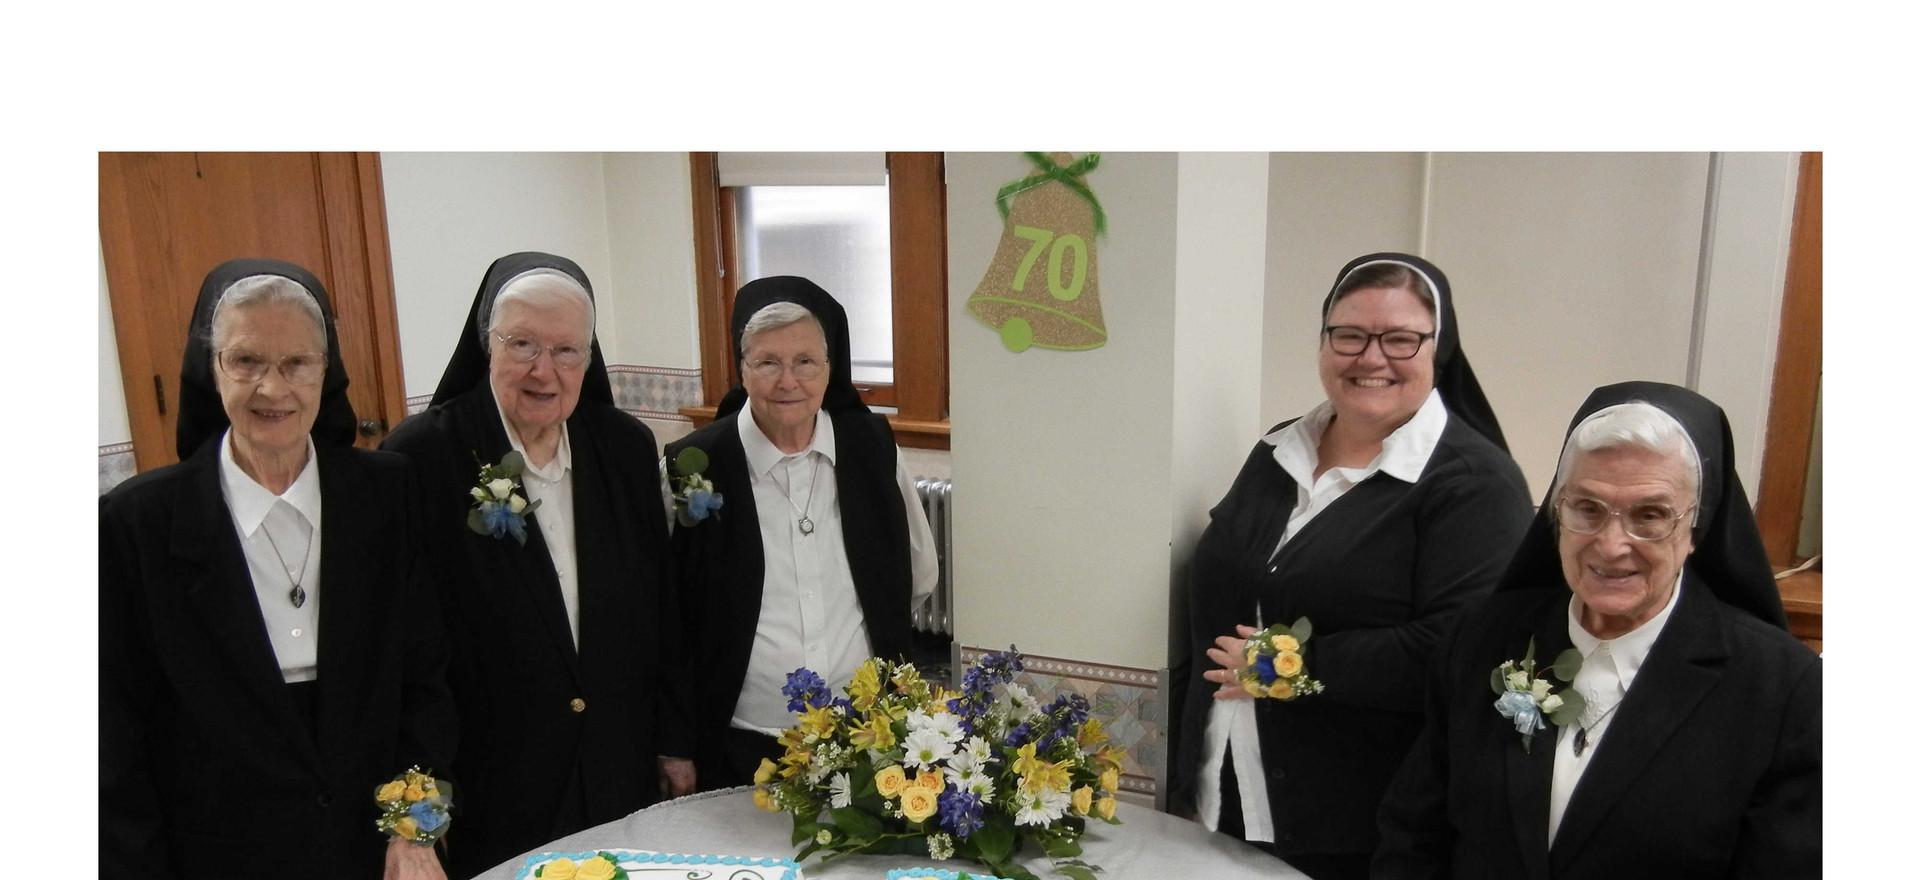 2109 Jubilarians: S. Alice Mary, S. Rosemary and S. Francetta - 70 years. S. Carol - 40 years; S. Pauline - 75 years